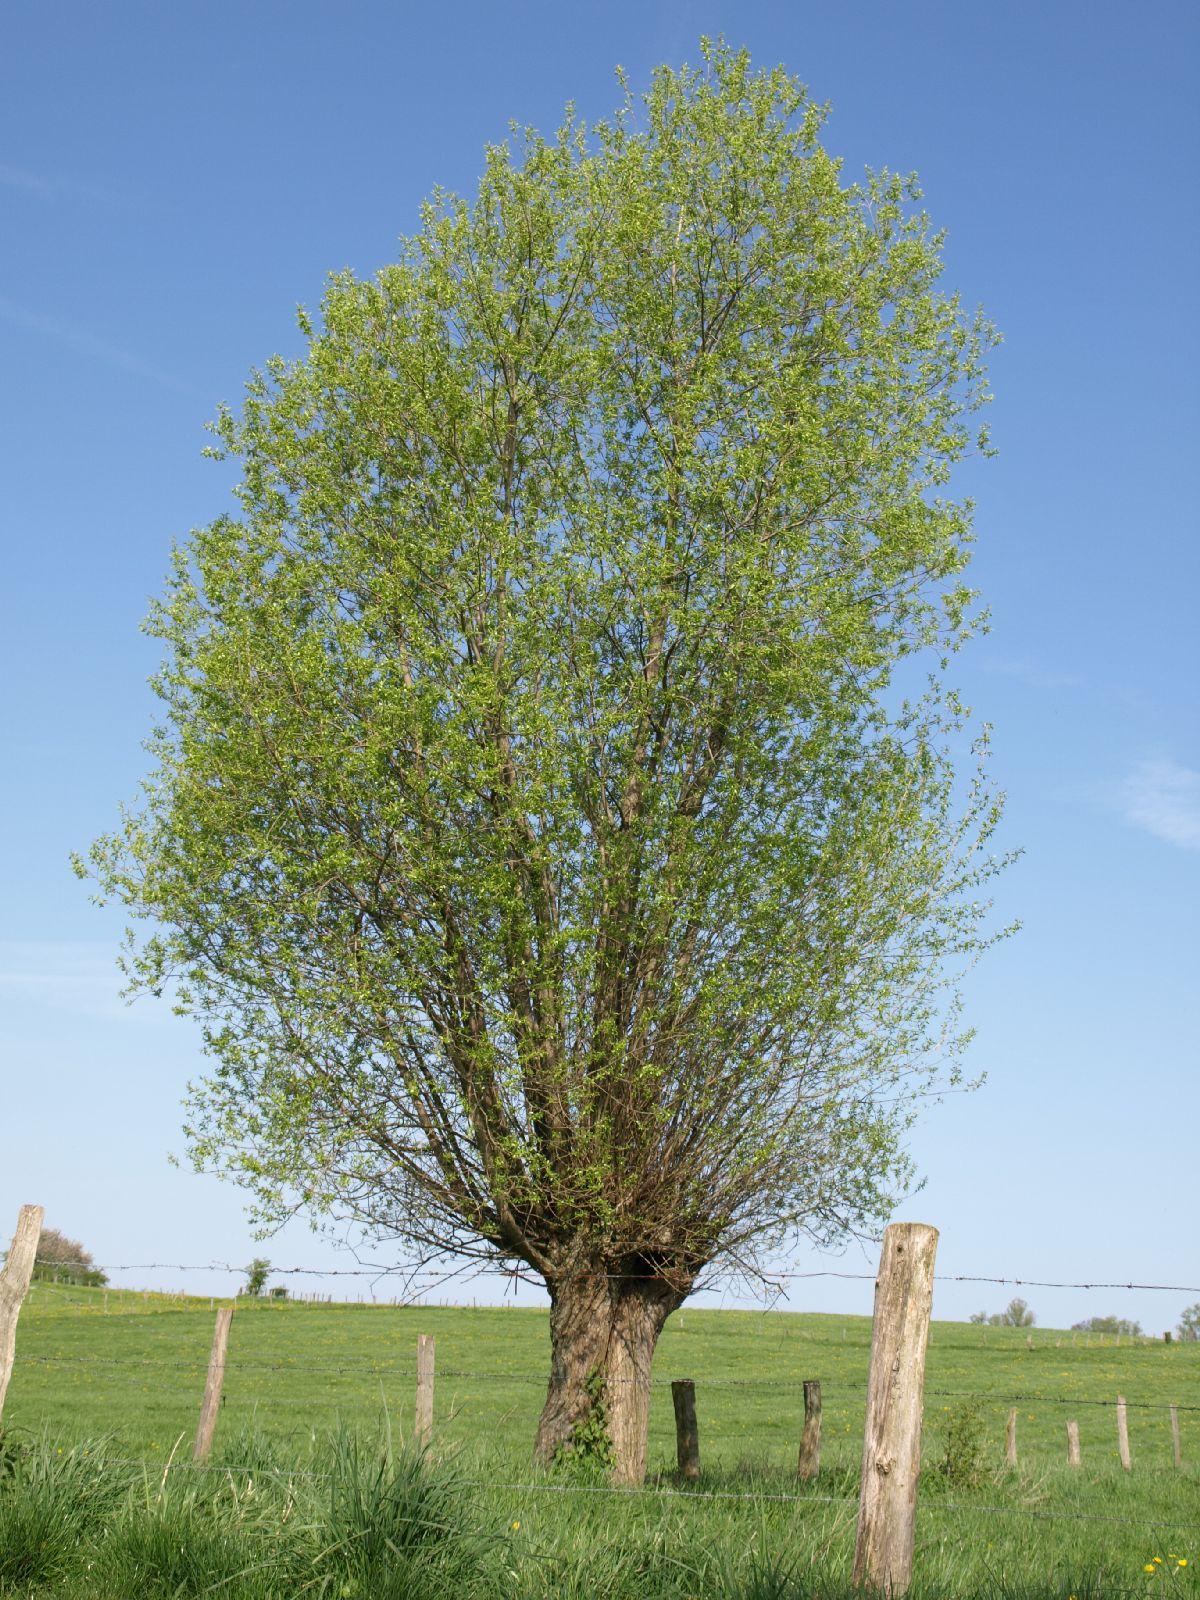 Pflanzen-Baum-Foto_Textur_B_P5042387